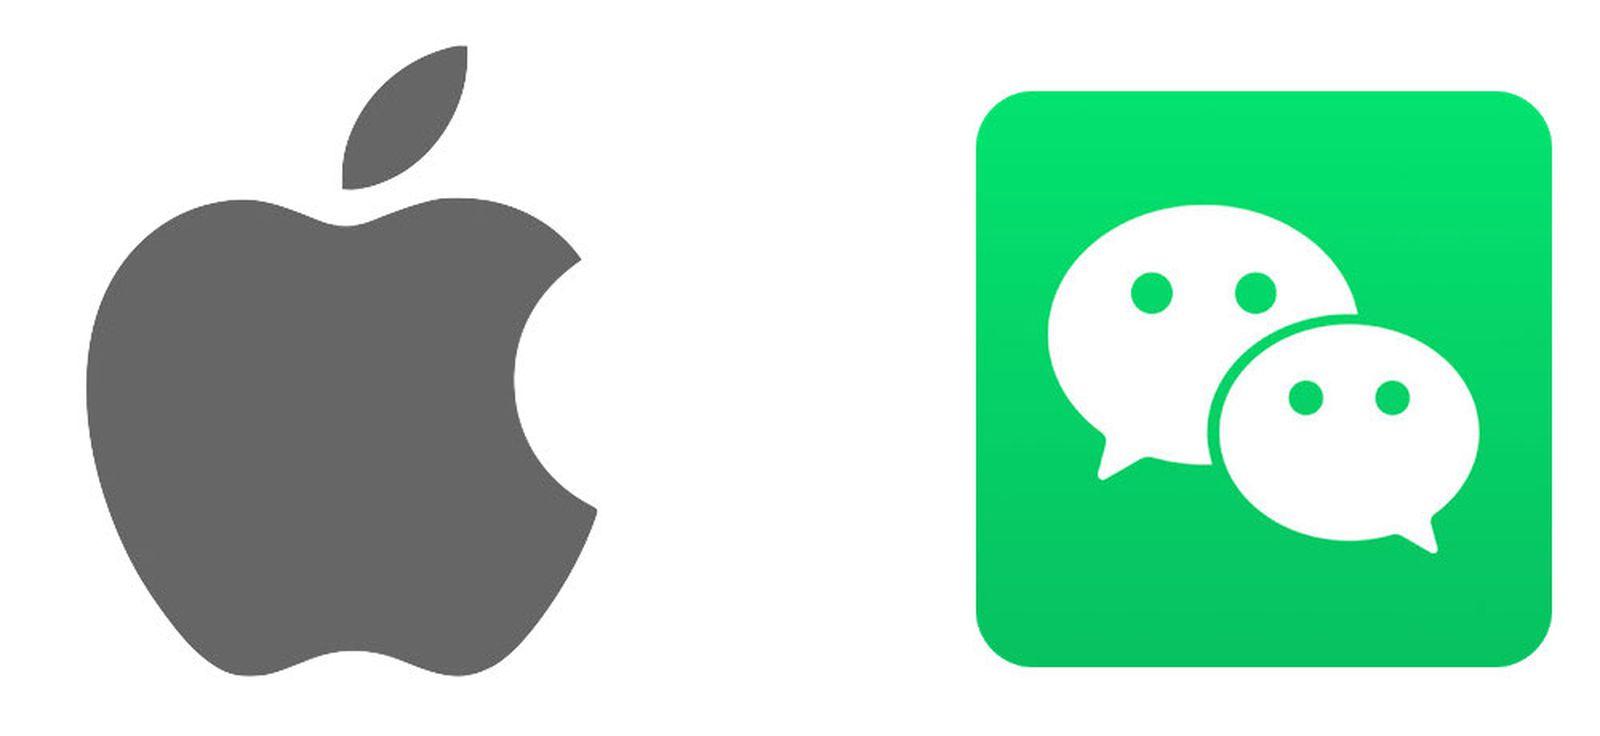 apple wechat - قاضی دادگاه آمریکا مخالف ممنوعیت WeChat است